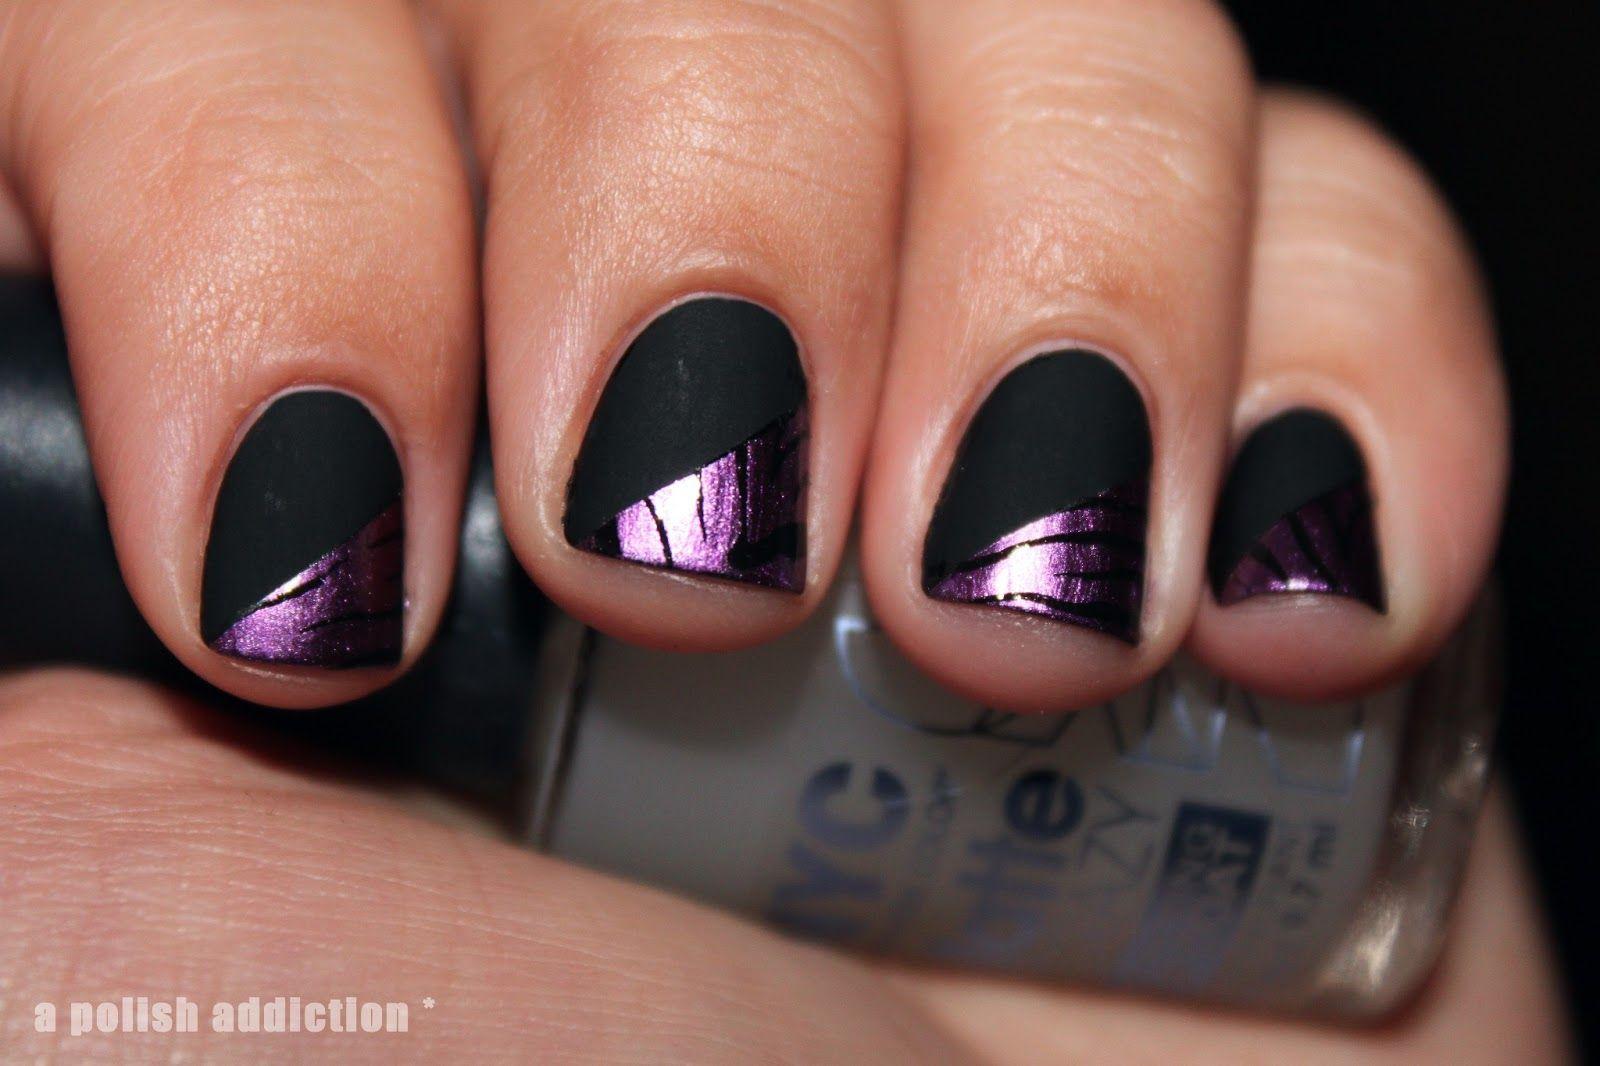 Black matte nails with a purple zebra design i might like a ...